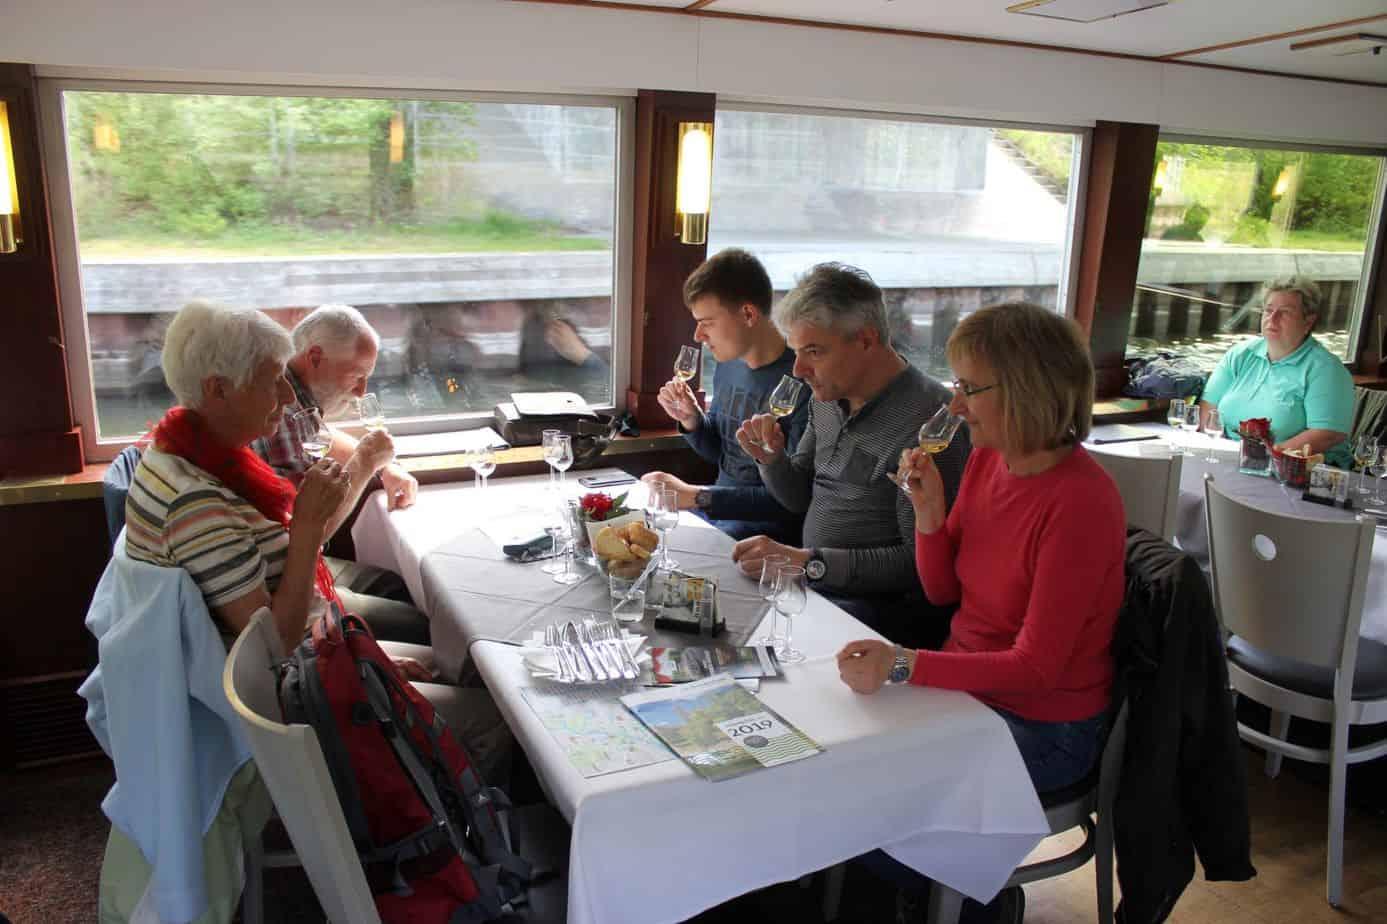 whisky-tasting-dresden-schifffahrt-teilwhisky.de